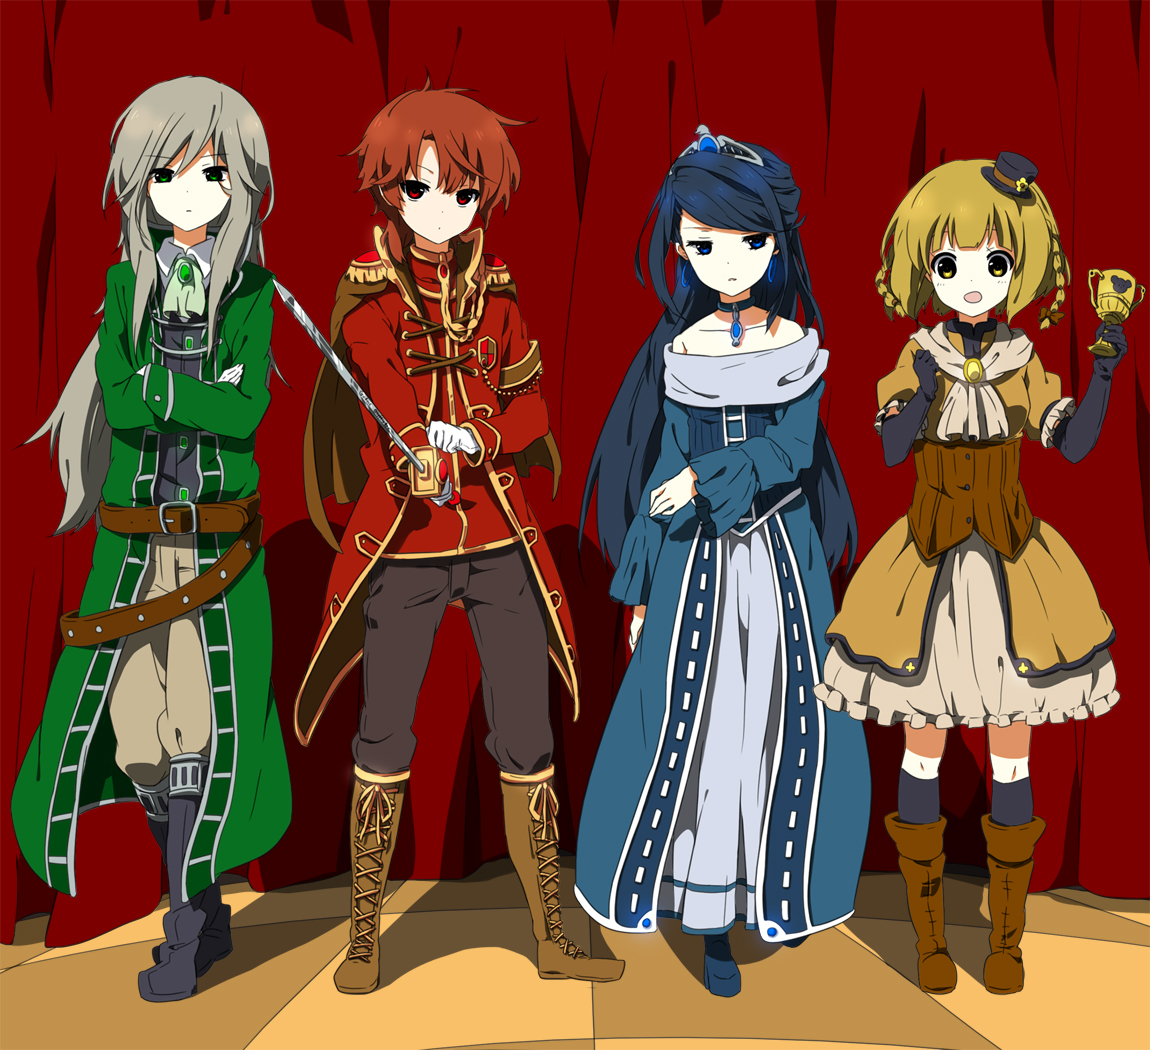 Anime Characters Hogwarts Houses : Rowena ravenclaw harry potter zerochan anime image board